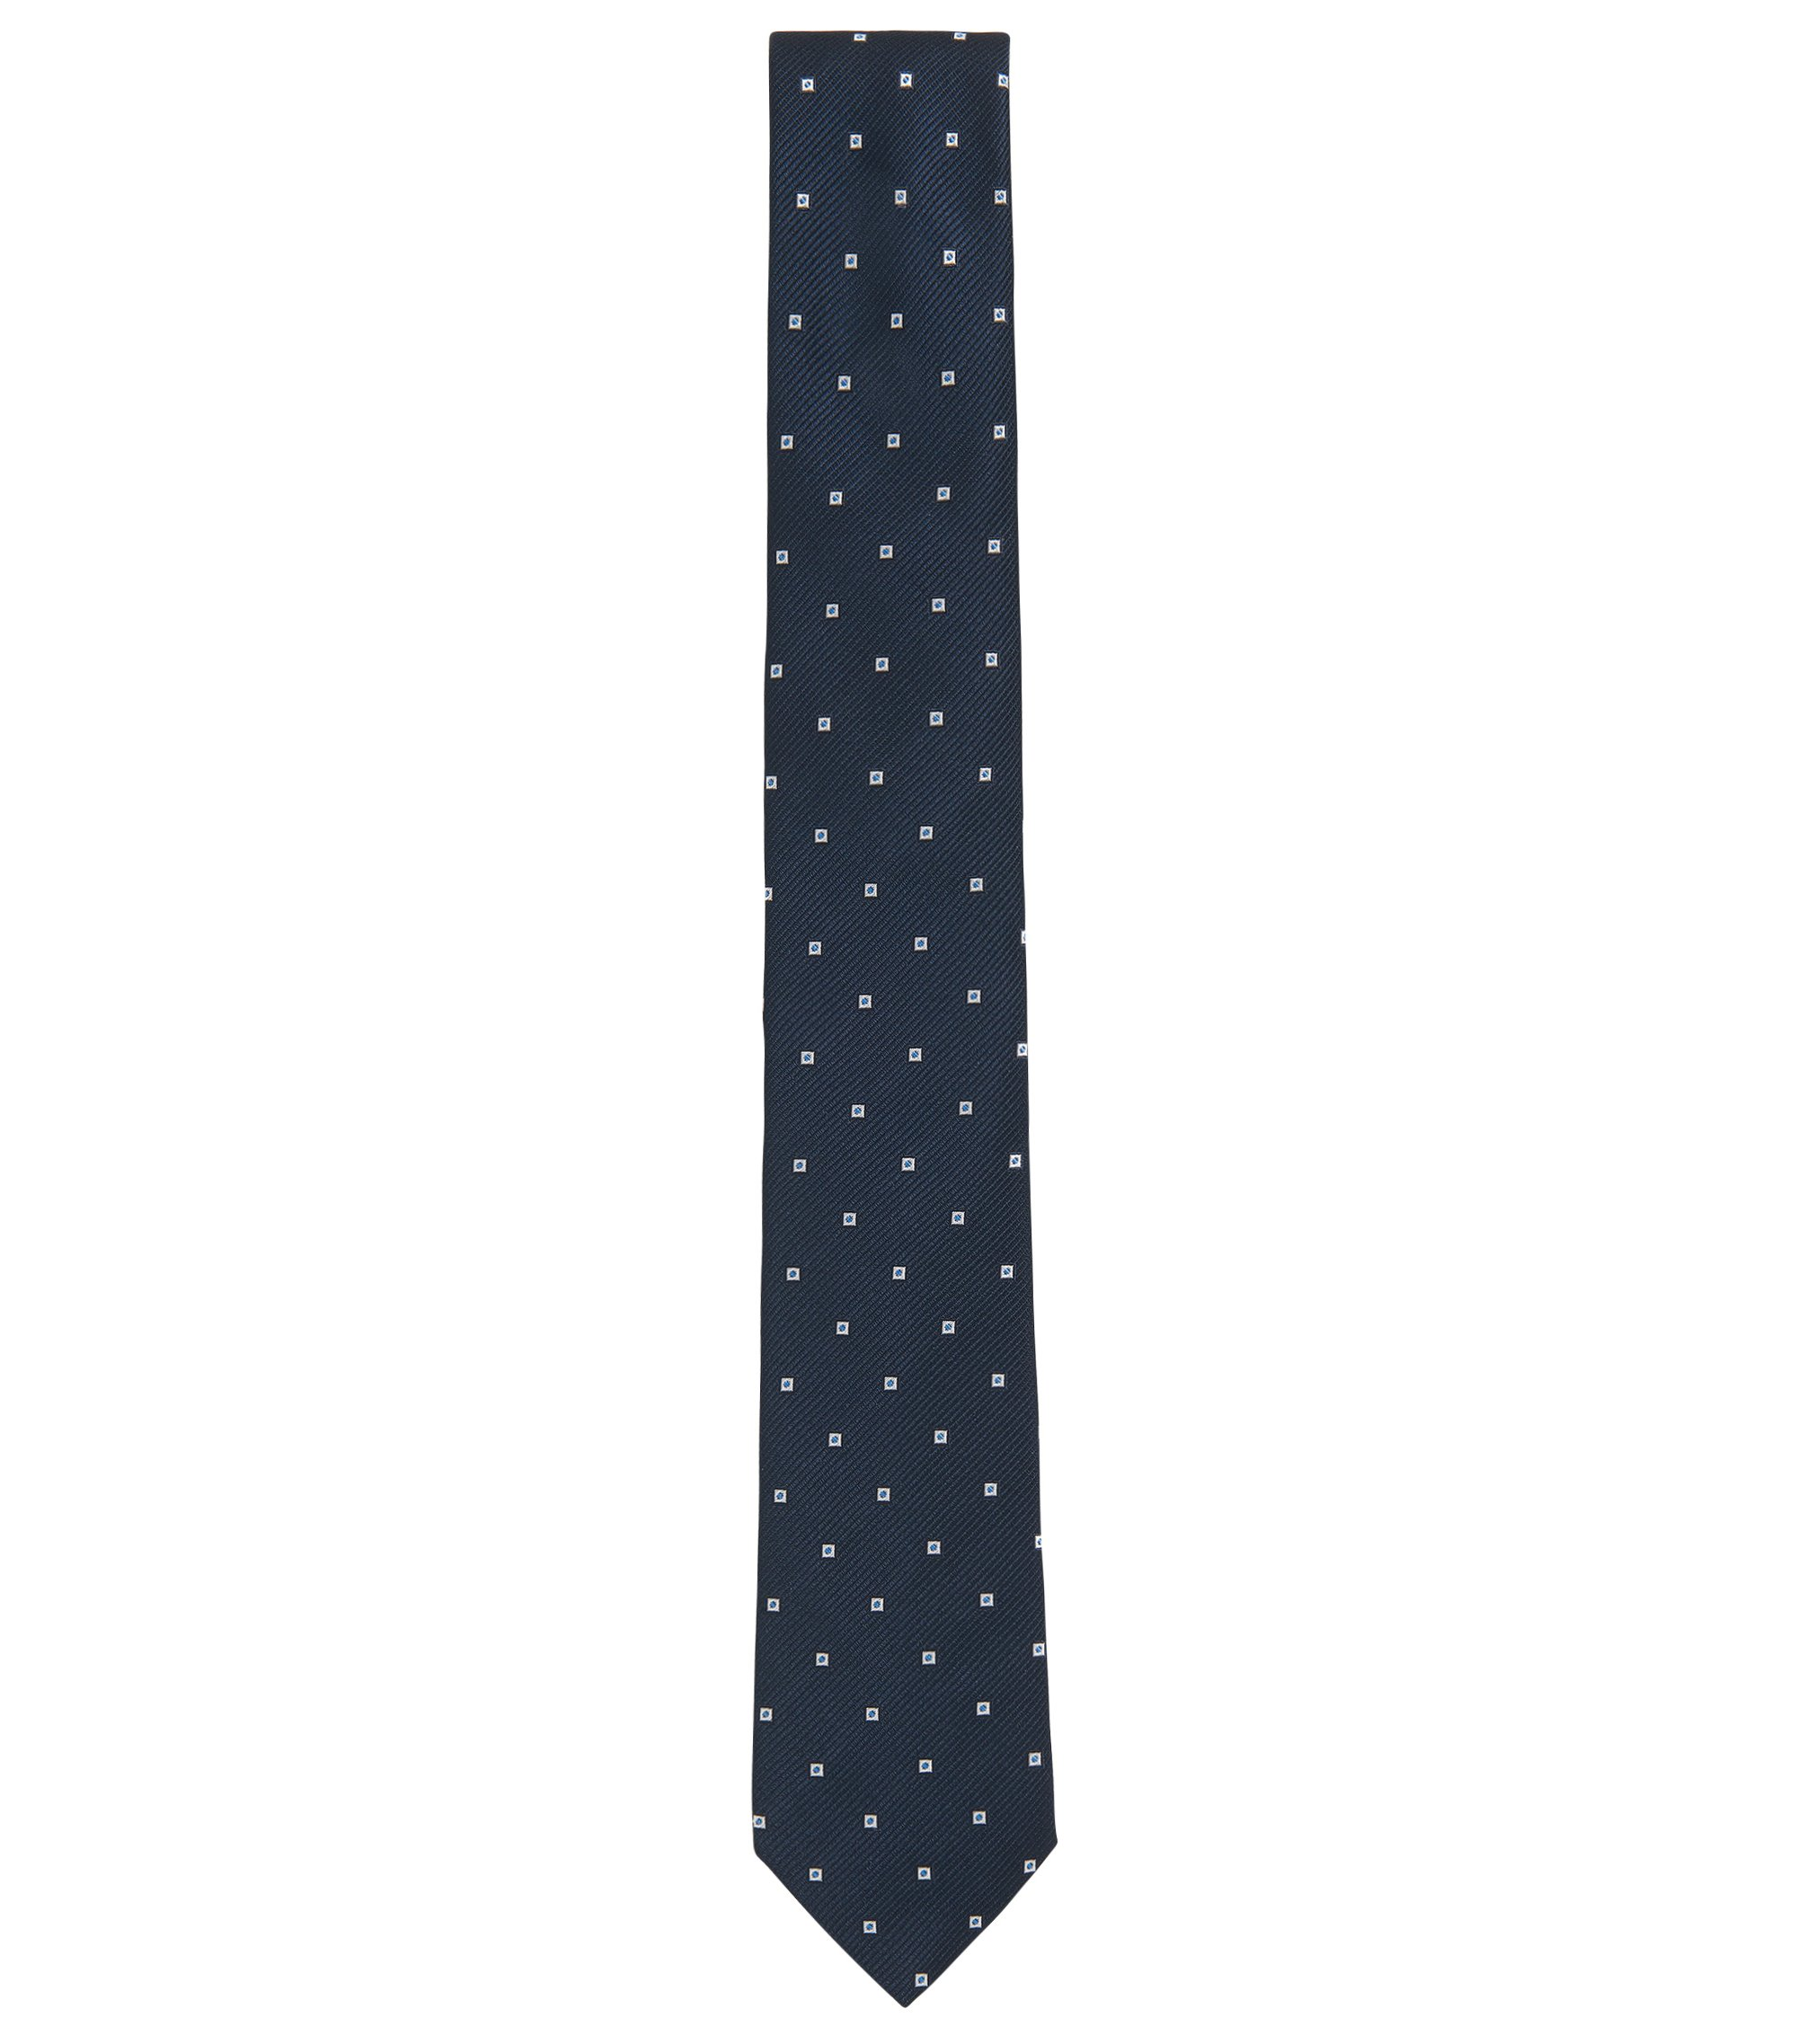 Gemusterte Krawatte aus garngefärbtem Seiden-Jacquard, Dunkelblau